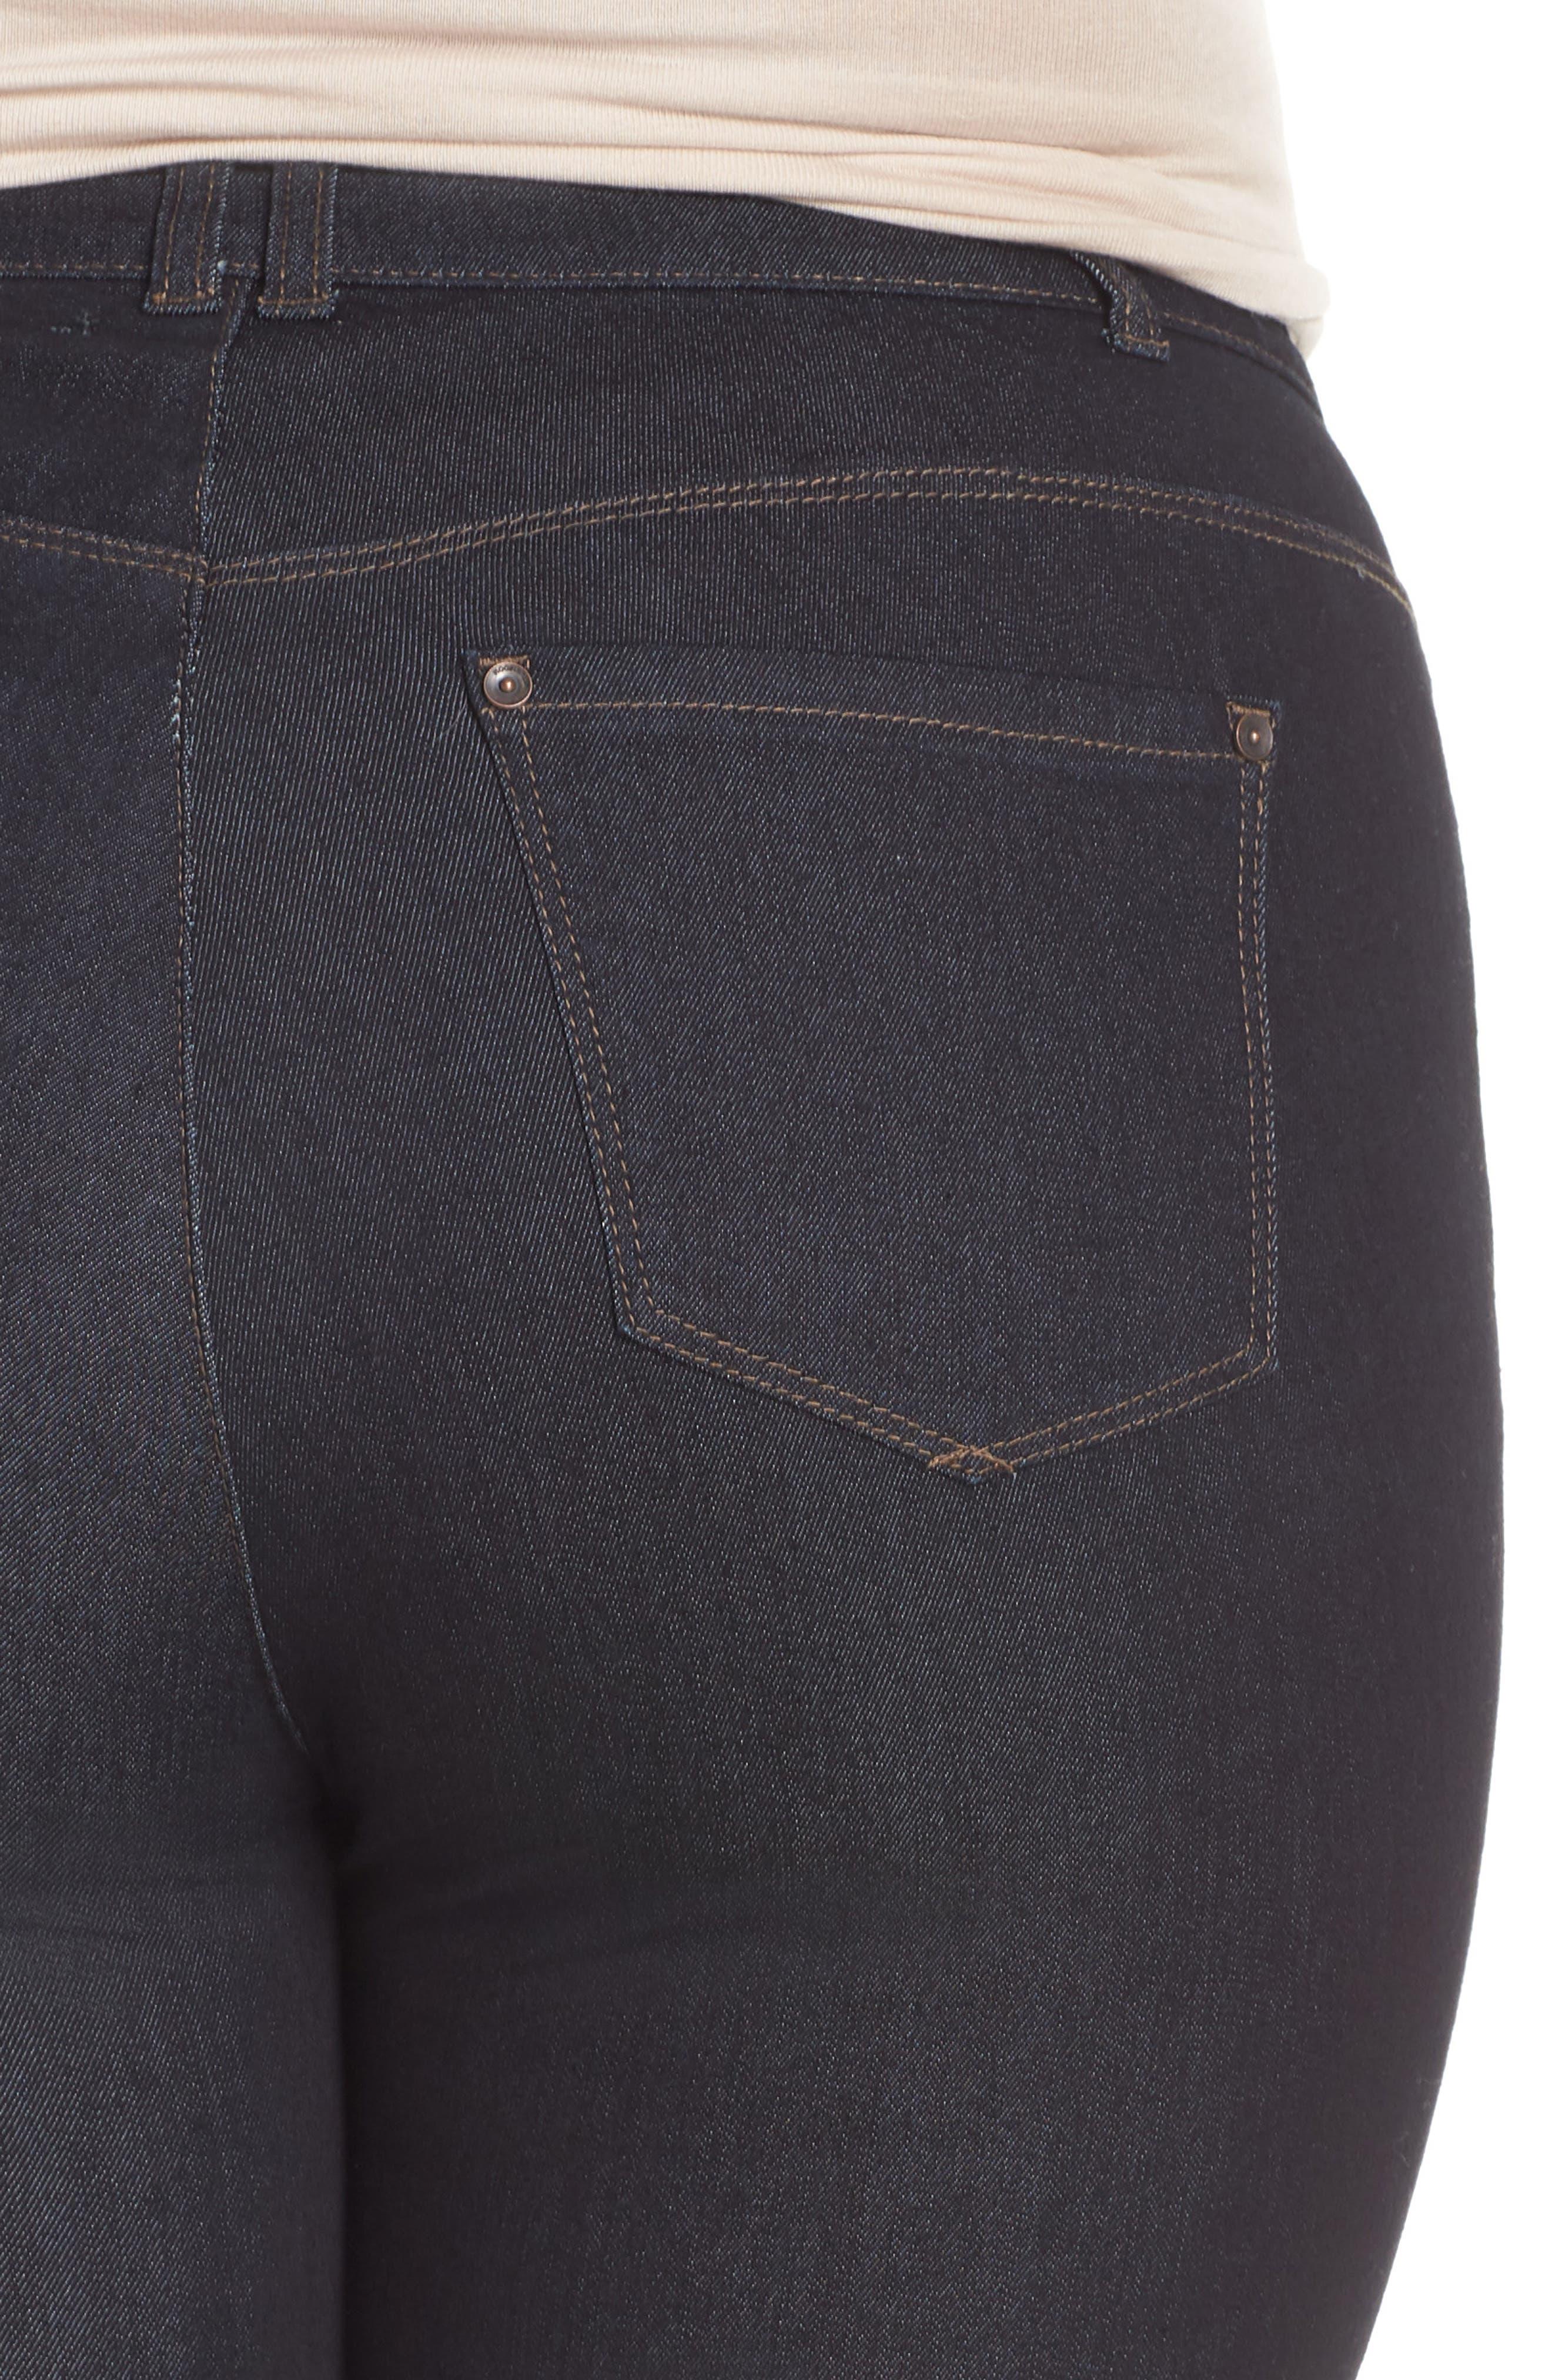 30/11 Ab-solution High Waist Skinny Jeans,                             Alternate thumbnail 4, color,                             INDIGO